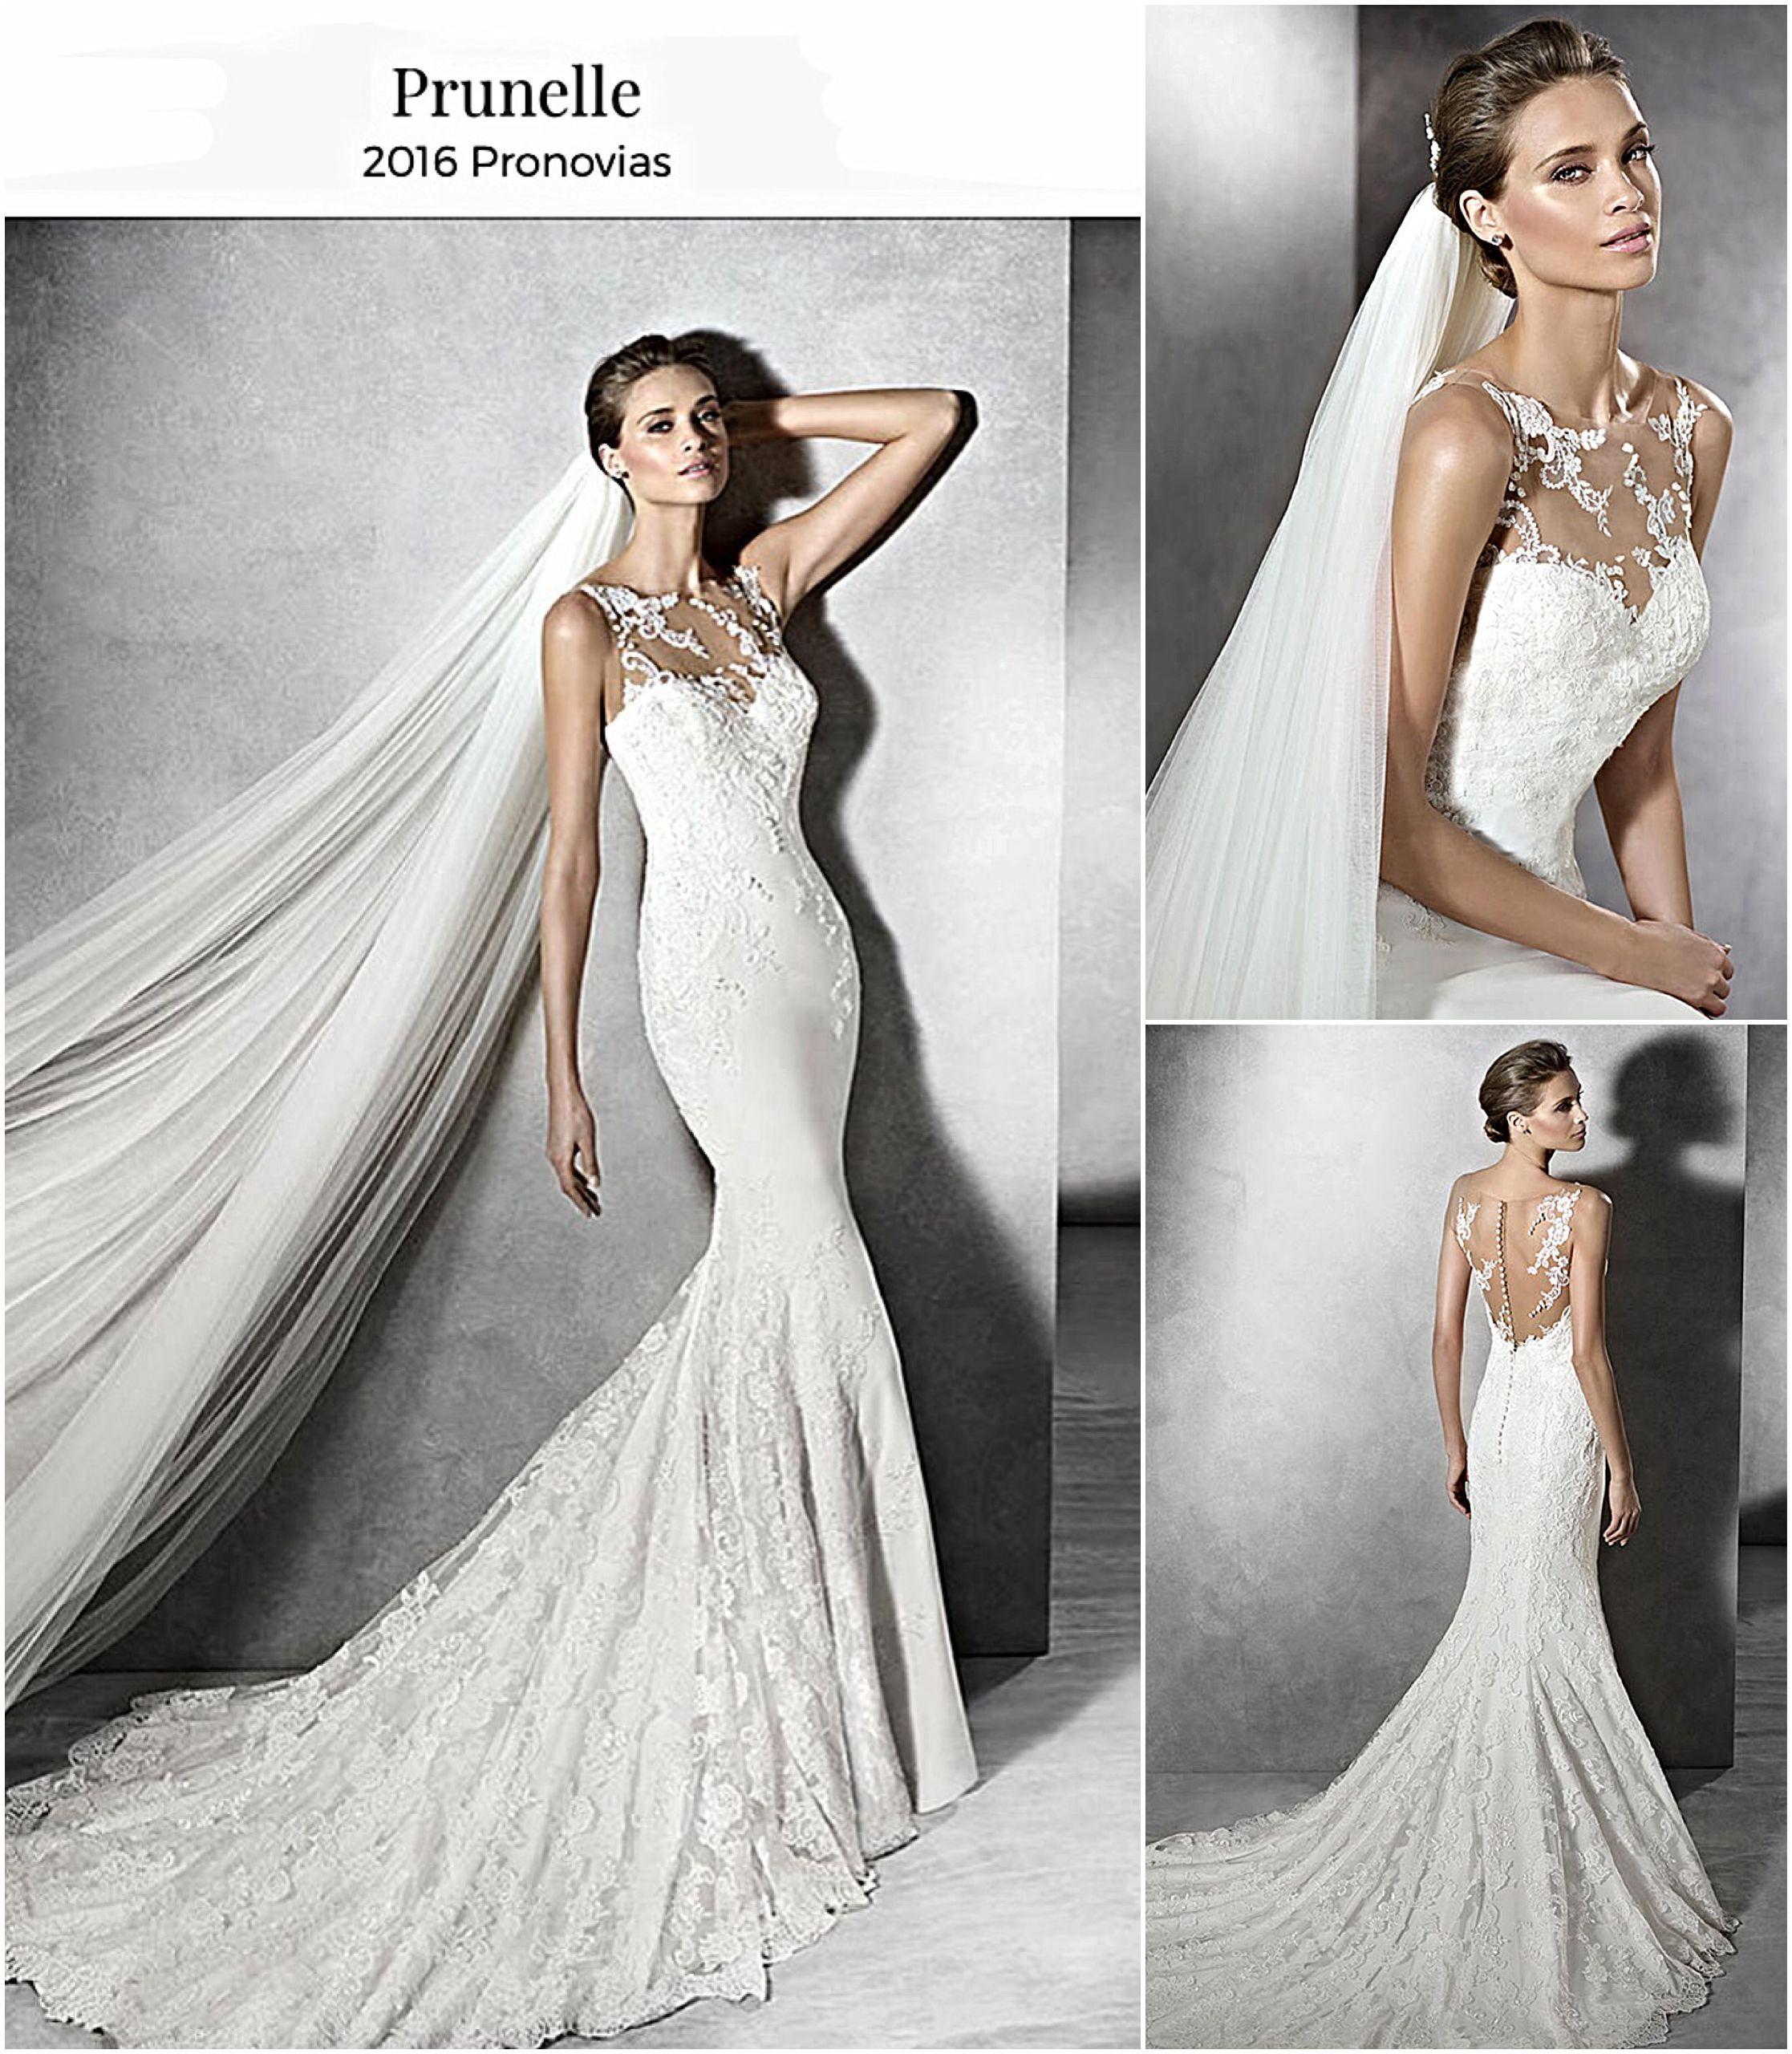 Pronovias Real Wedding Inspiration: Wedding Gowns, Bridesmaid